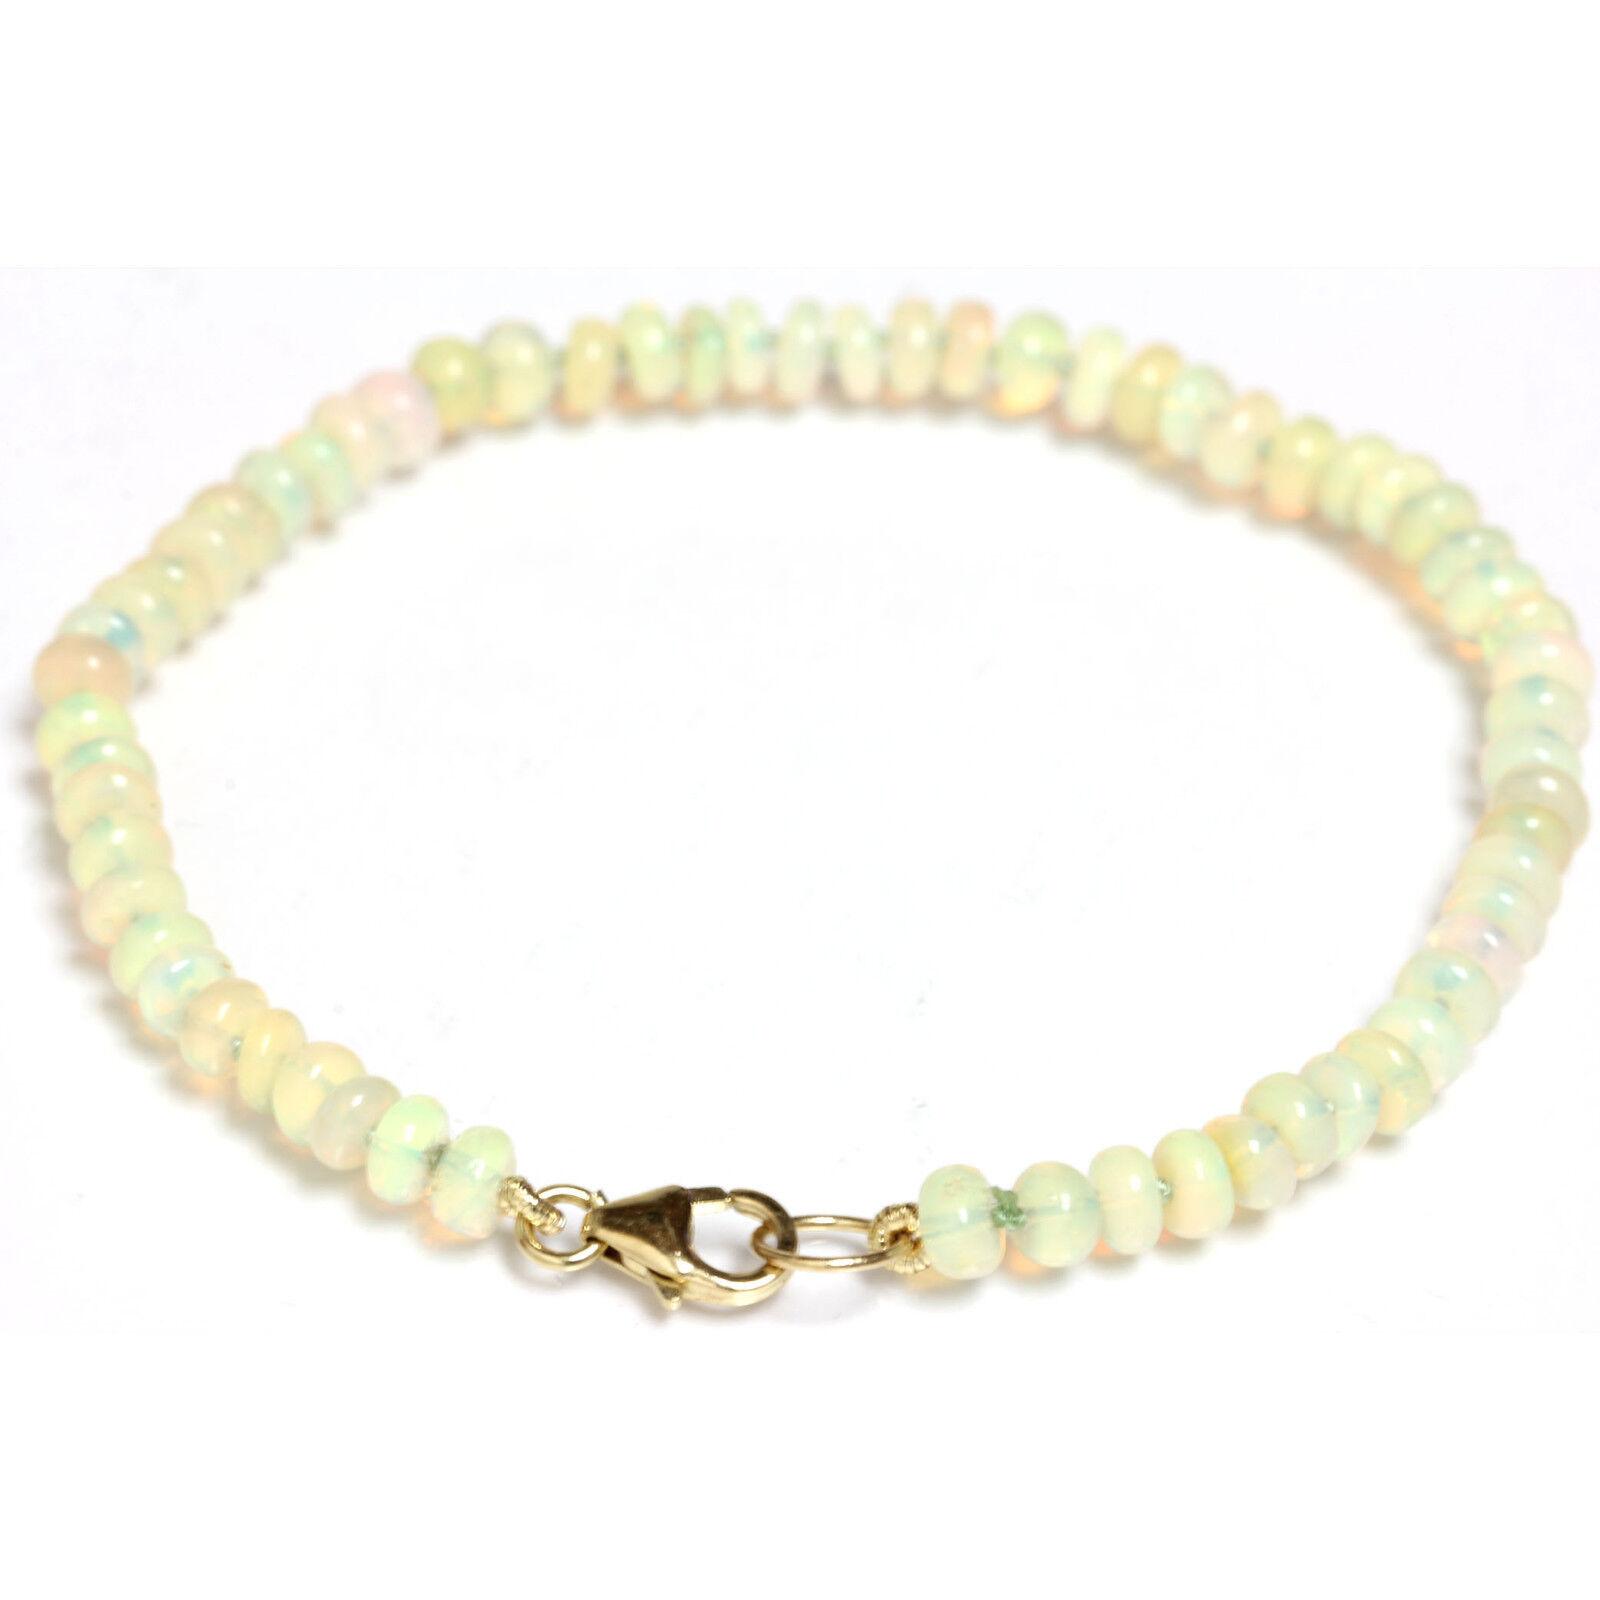 Ethiopian Fire Opal 4mm bead bracelet   Anklet 14k Yellow gold